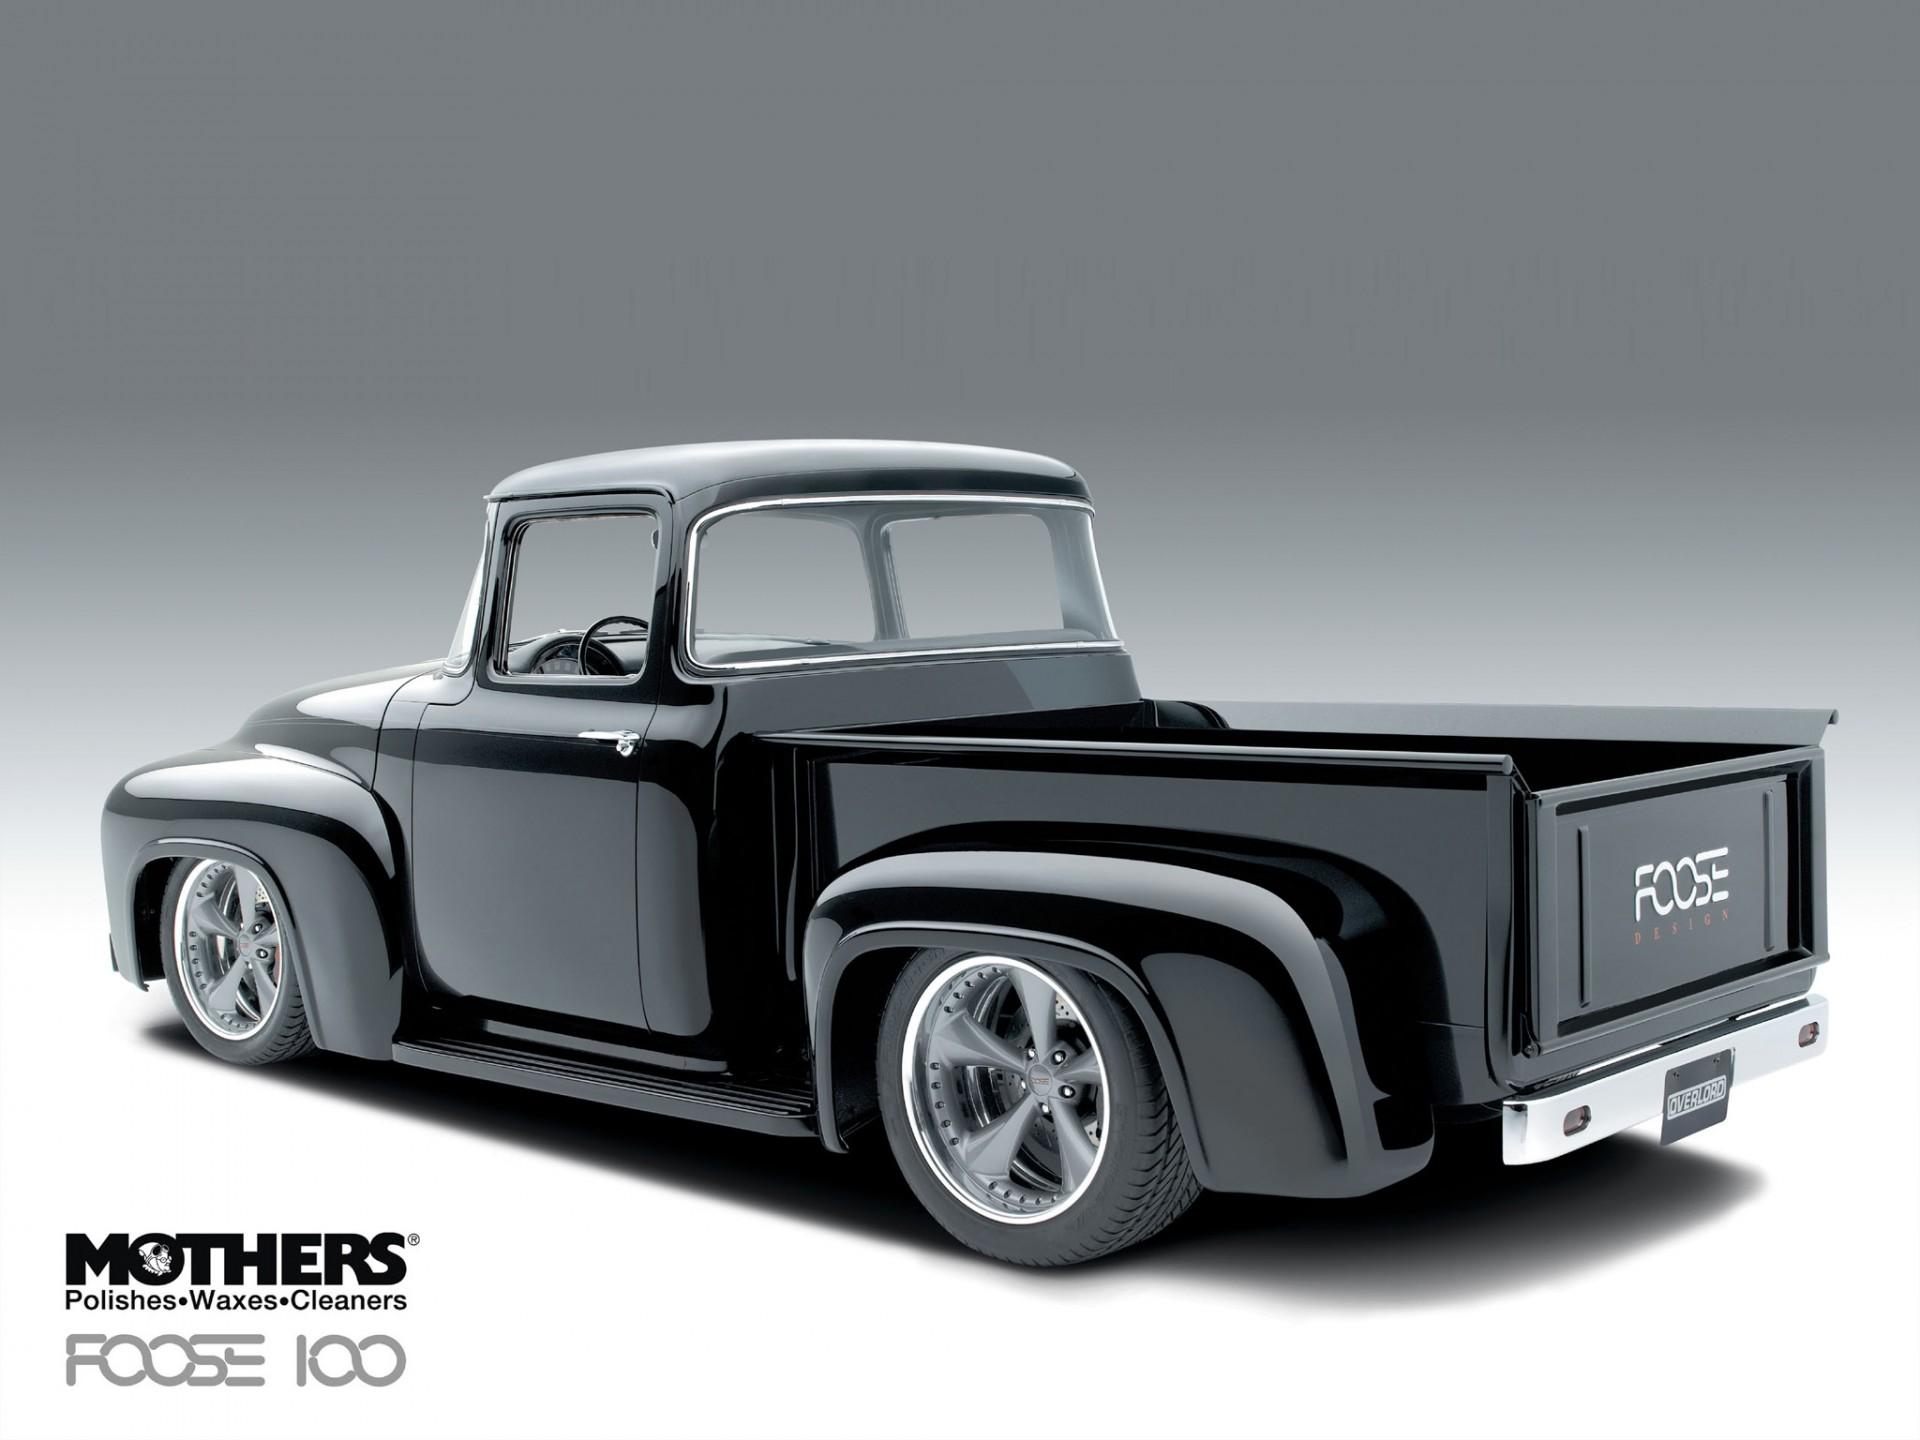 Vehicles   Hot Rod Wallpaper 1920x1440